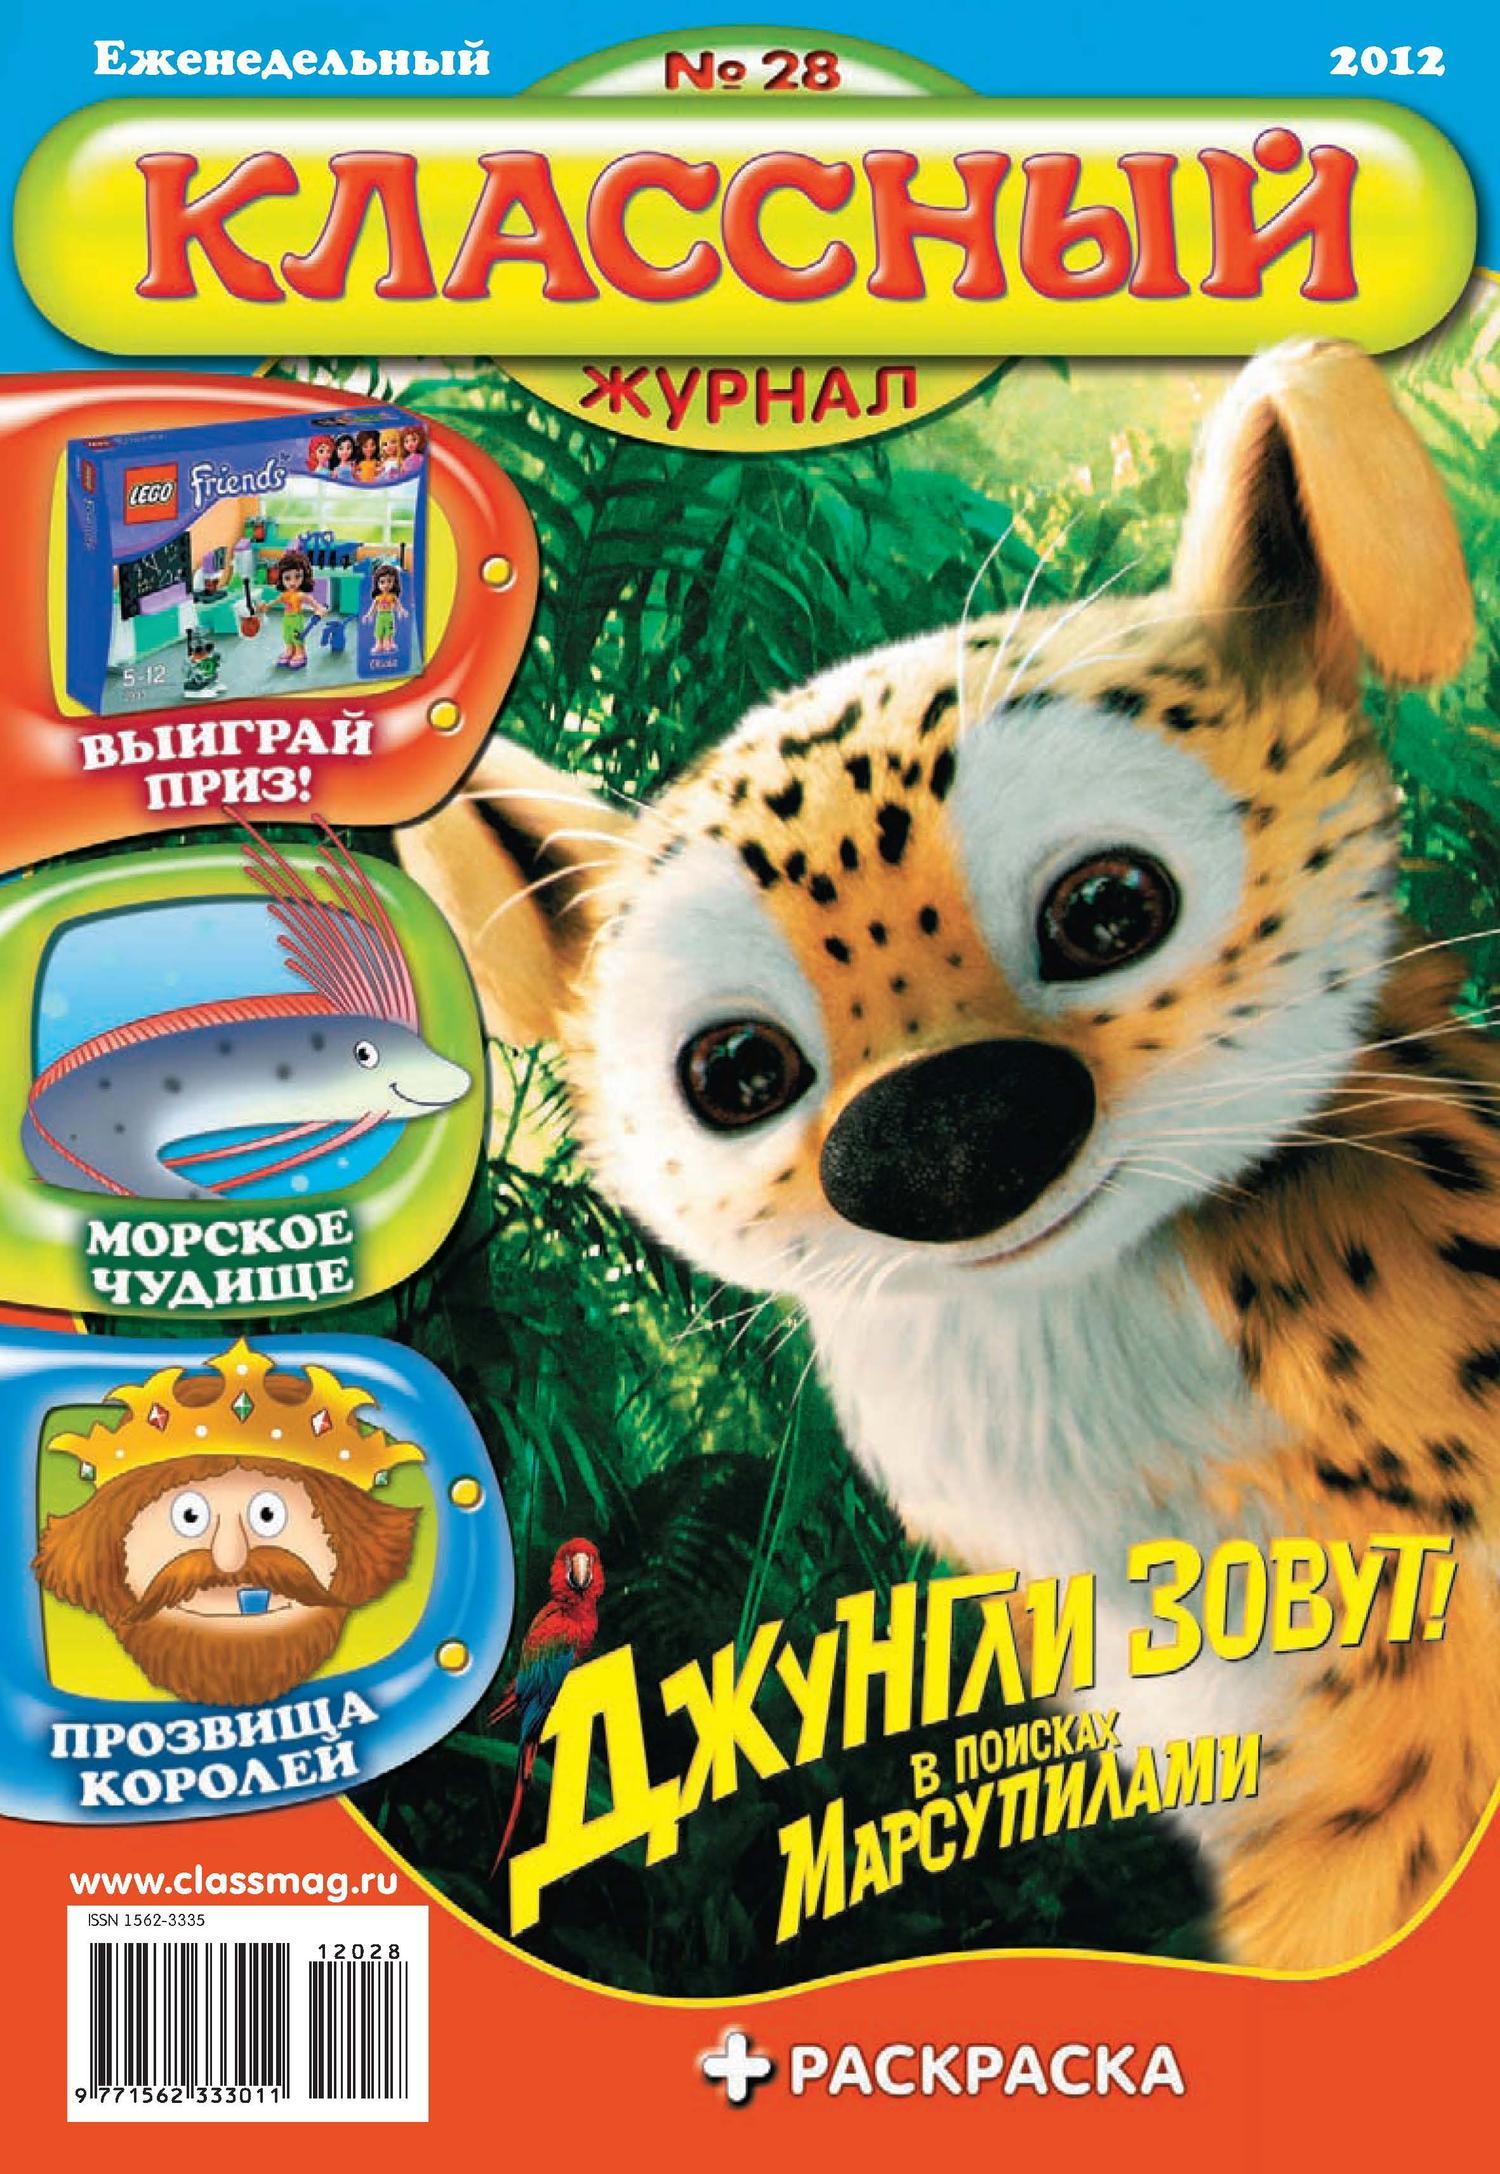 Классный журнал №28/2012